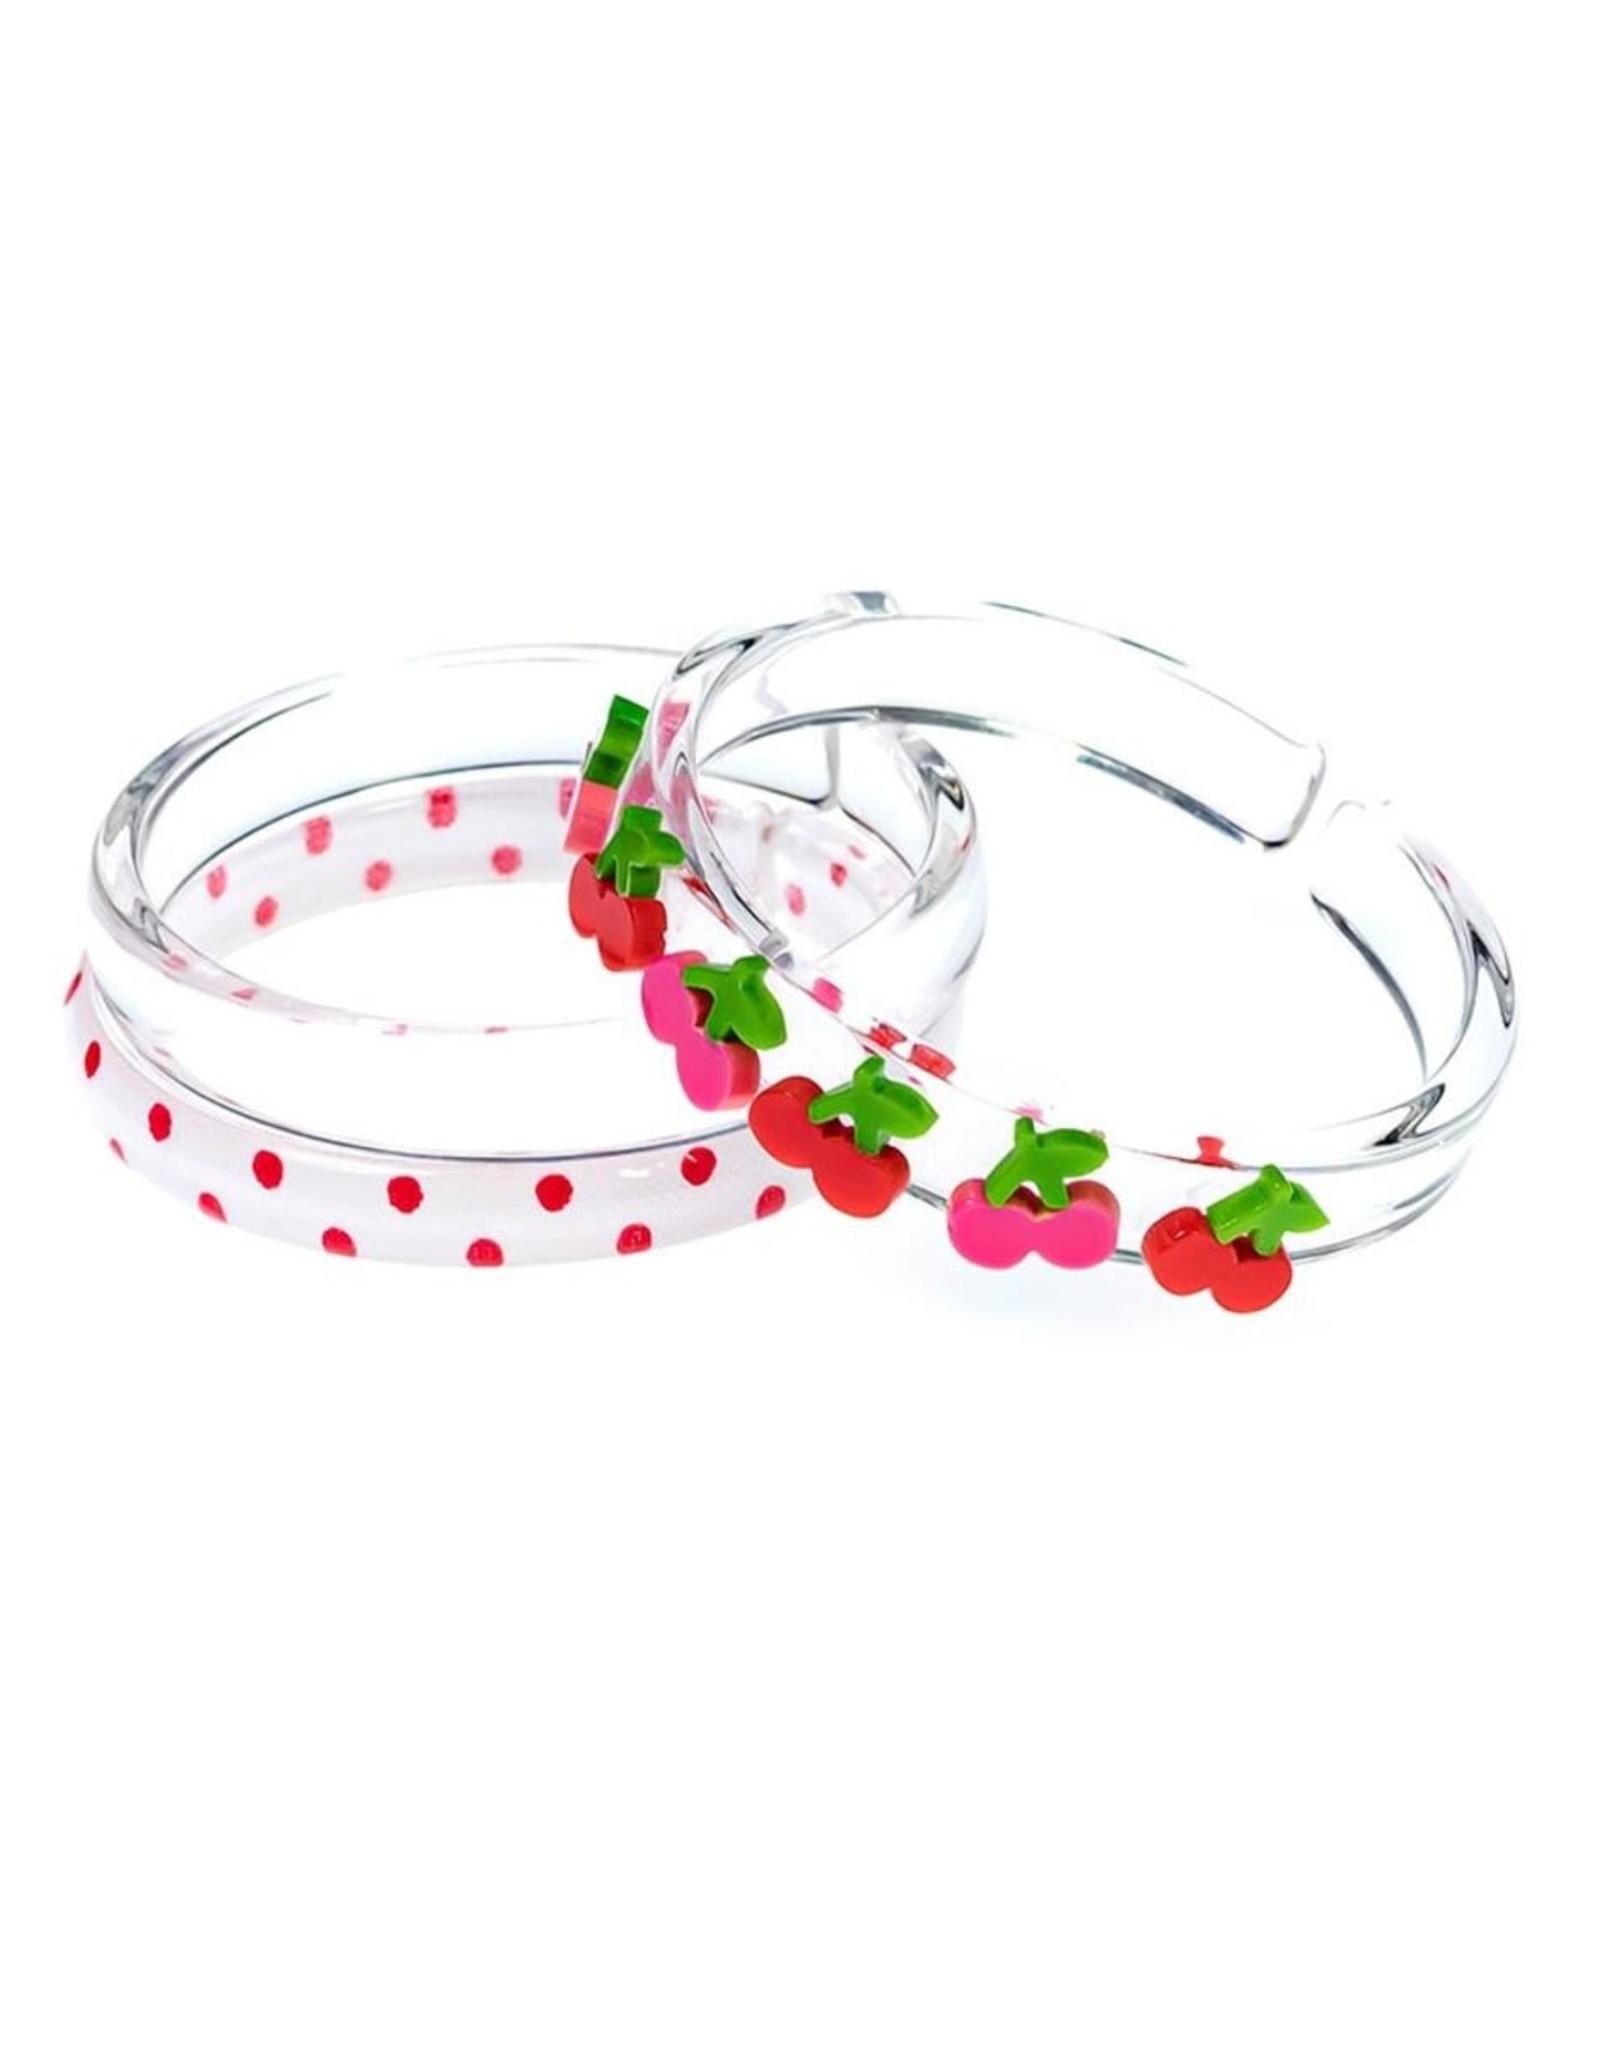 Lilies & Roses cherries bangles set